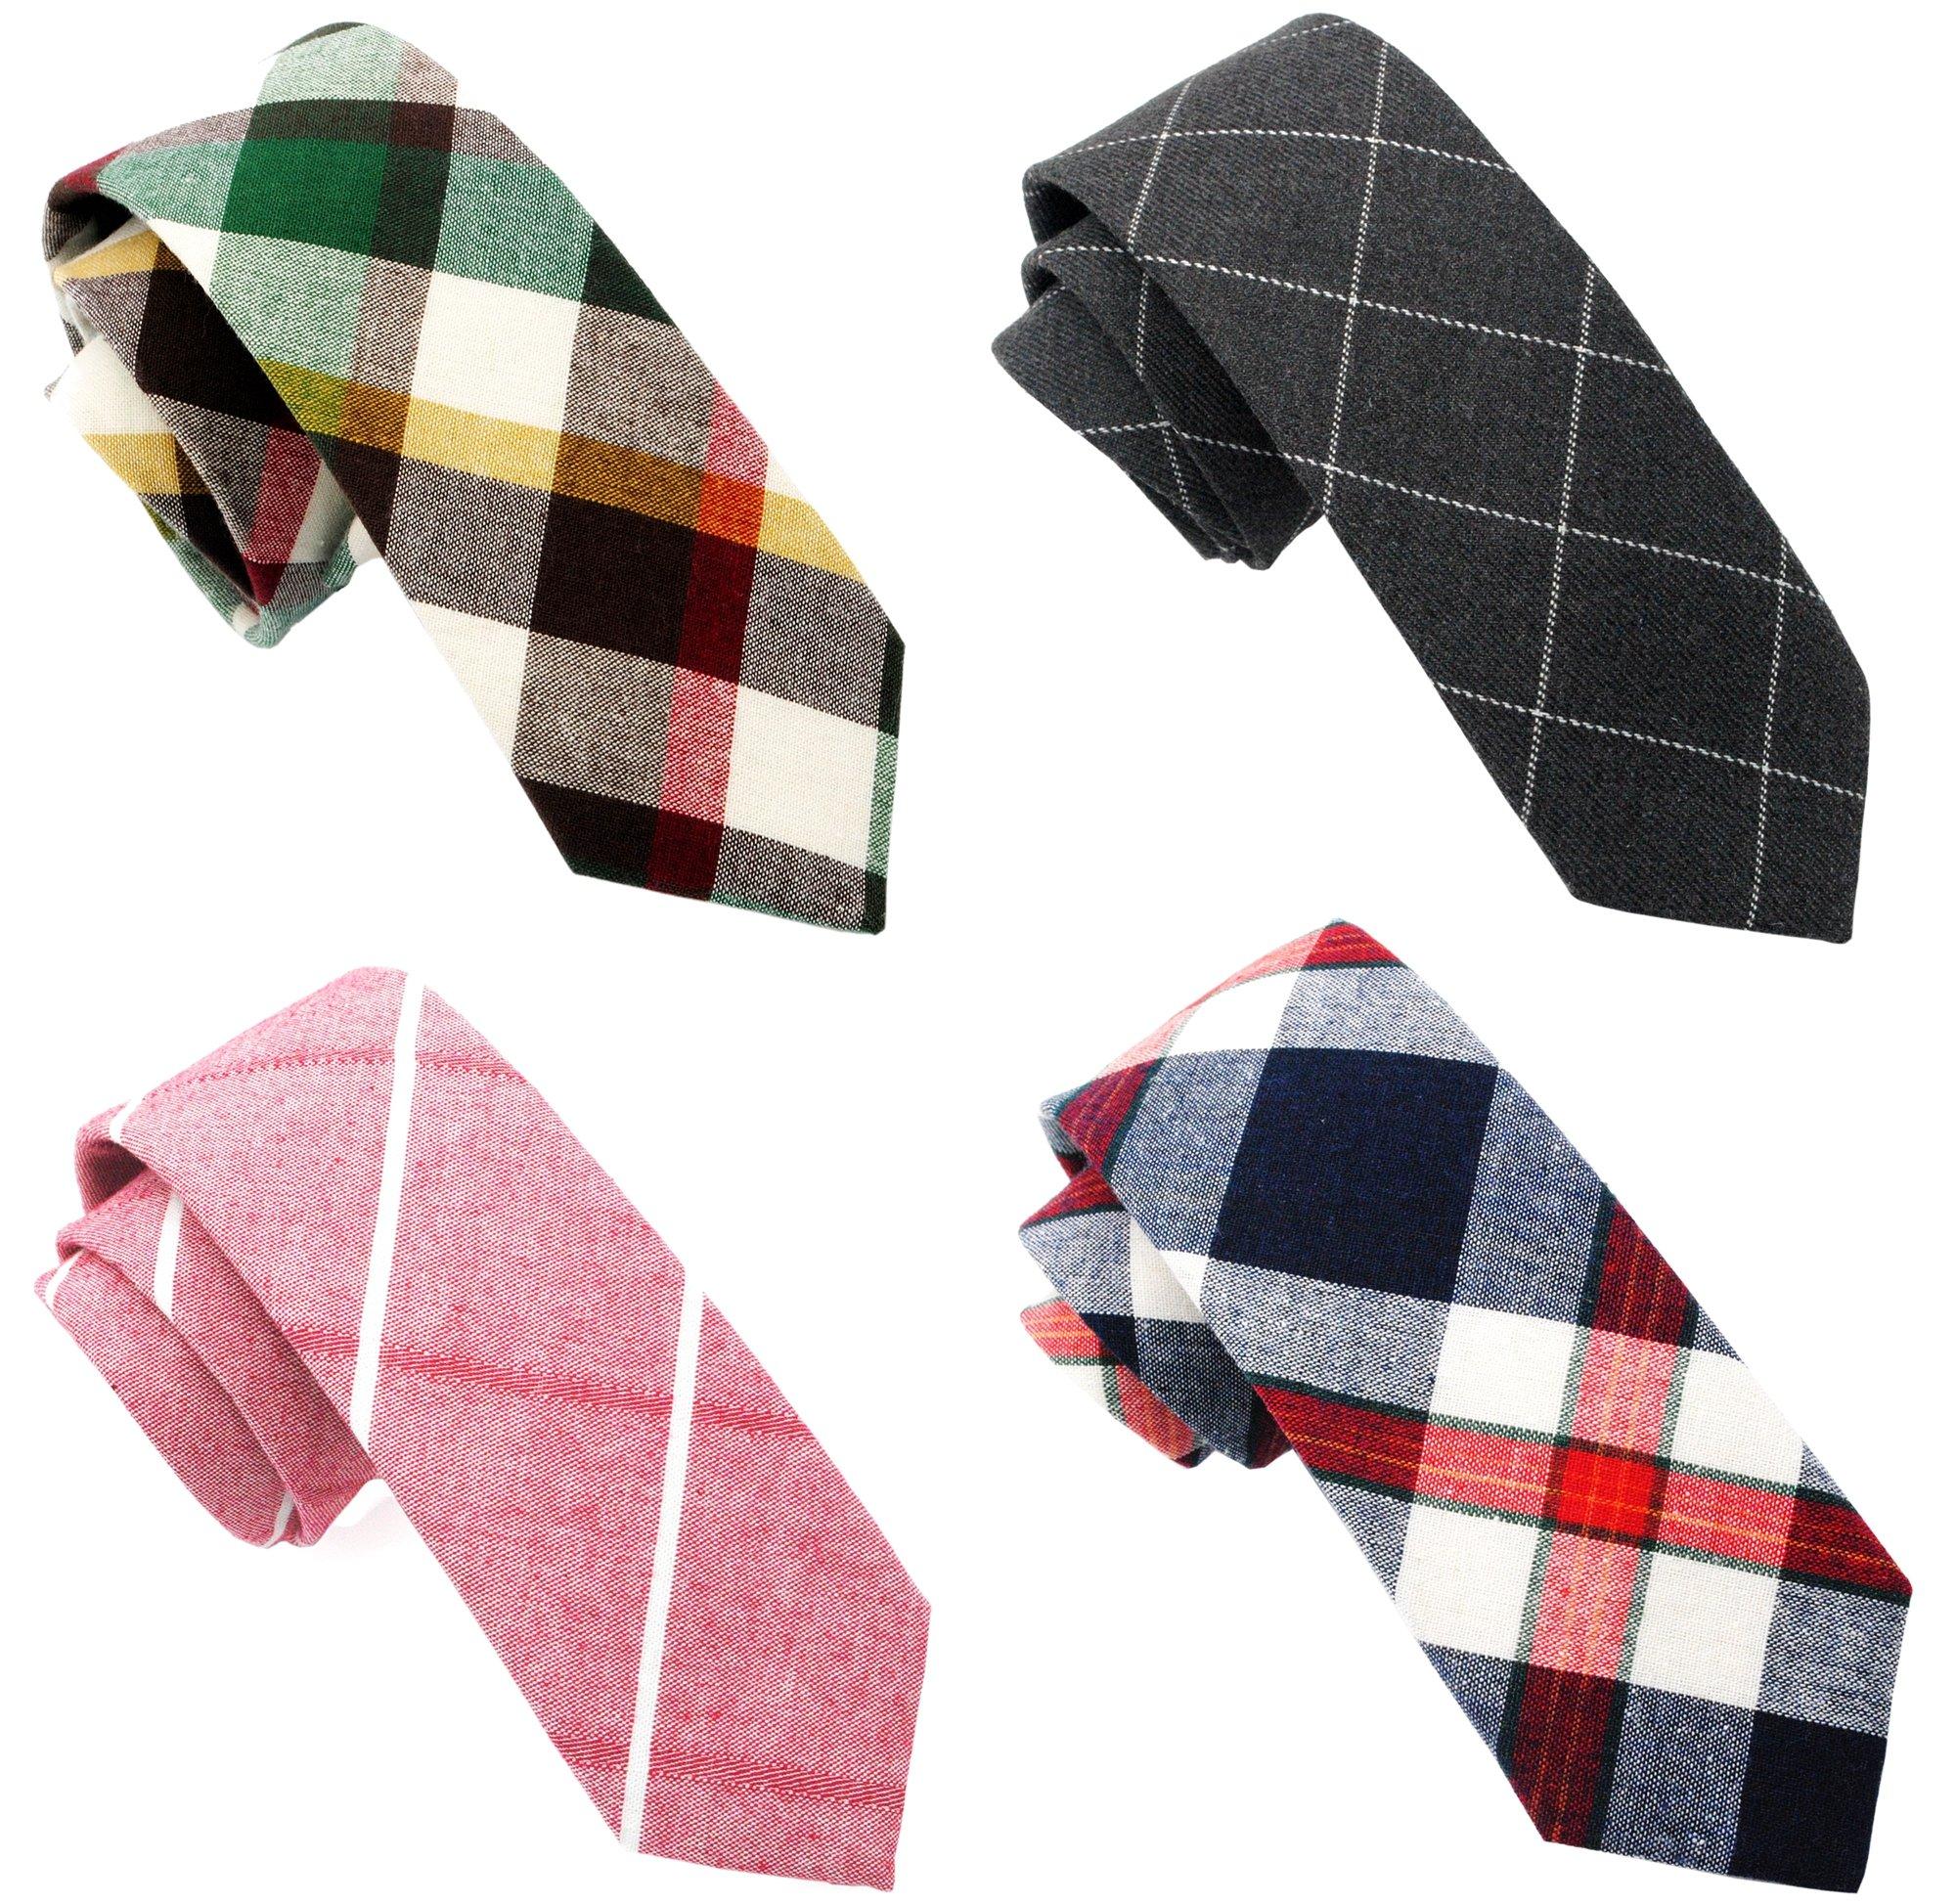 Casual Skinny Neckties for Men Cotton Plaid/Floral Slim Tie TG-006